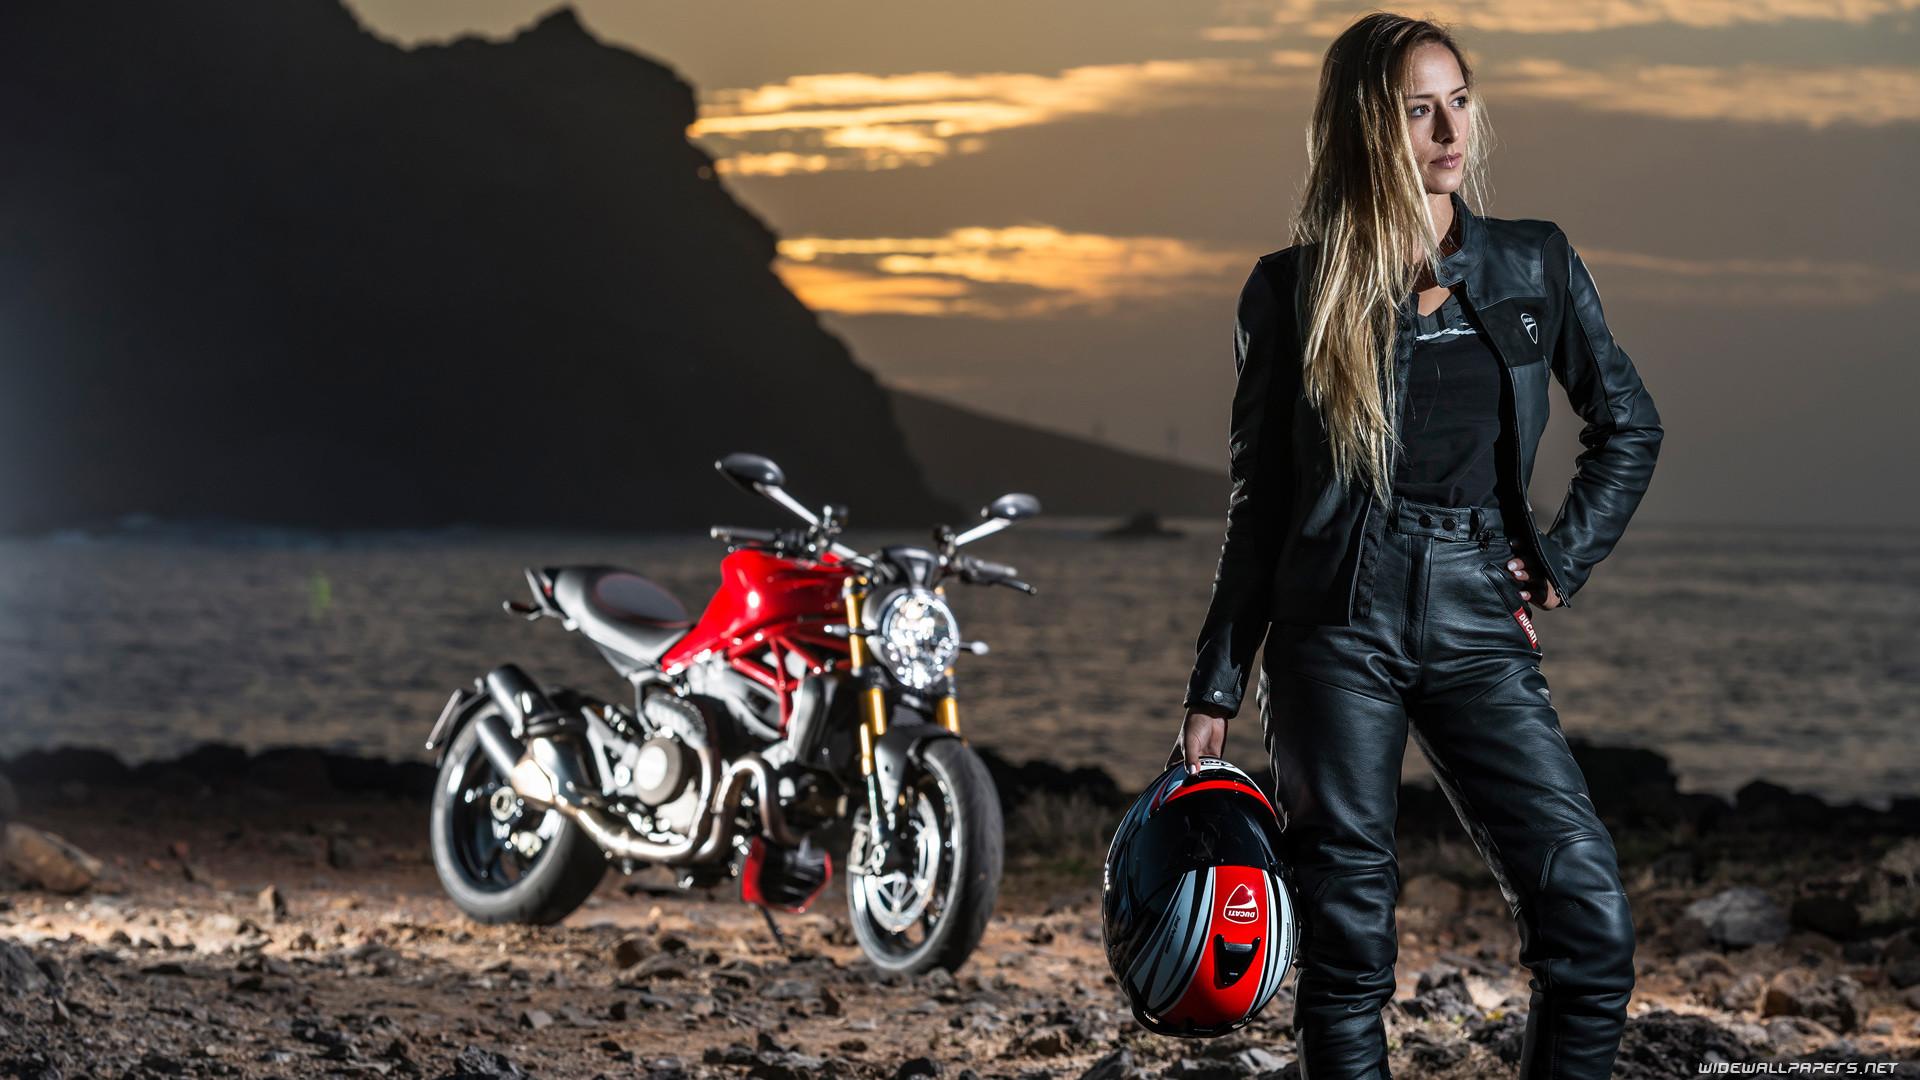 sportbike girl wallpaper (69+ images)